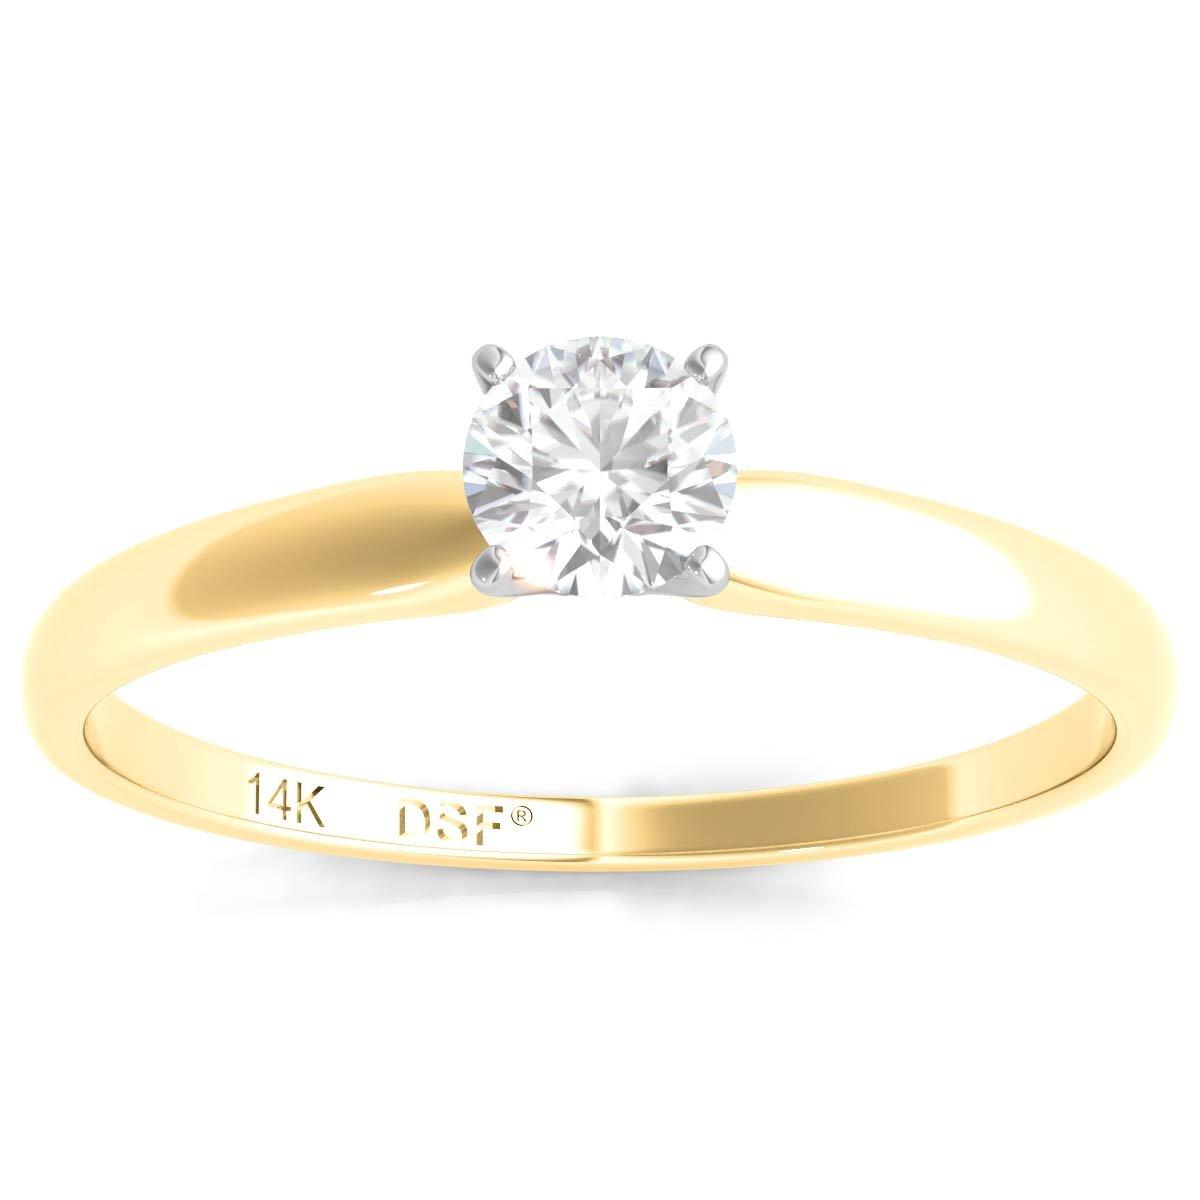 Diamond Studs Forever 14K Yellow Gold Solitaire Diamond Engagement Ring (1/3 Ct tw IGI Cert IJ/I1)